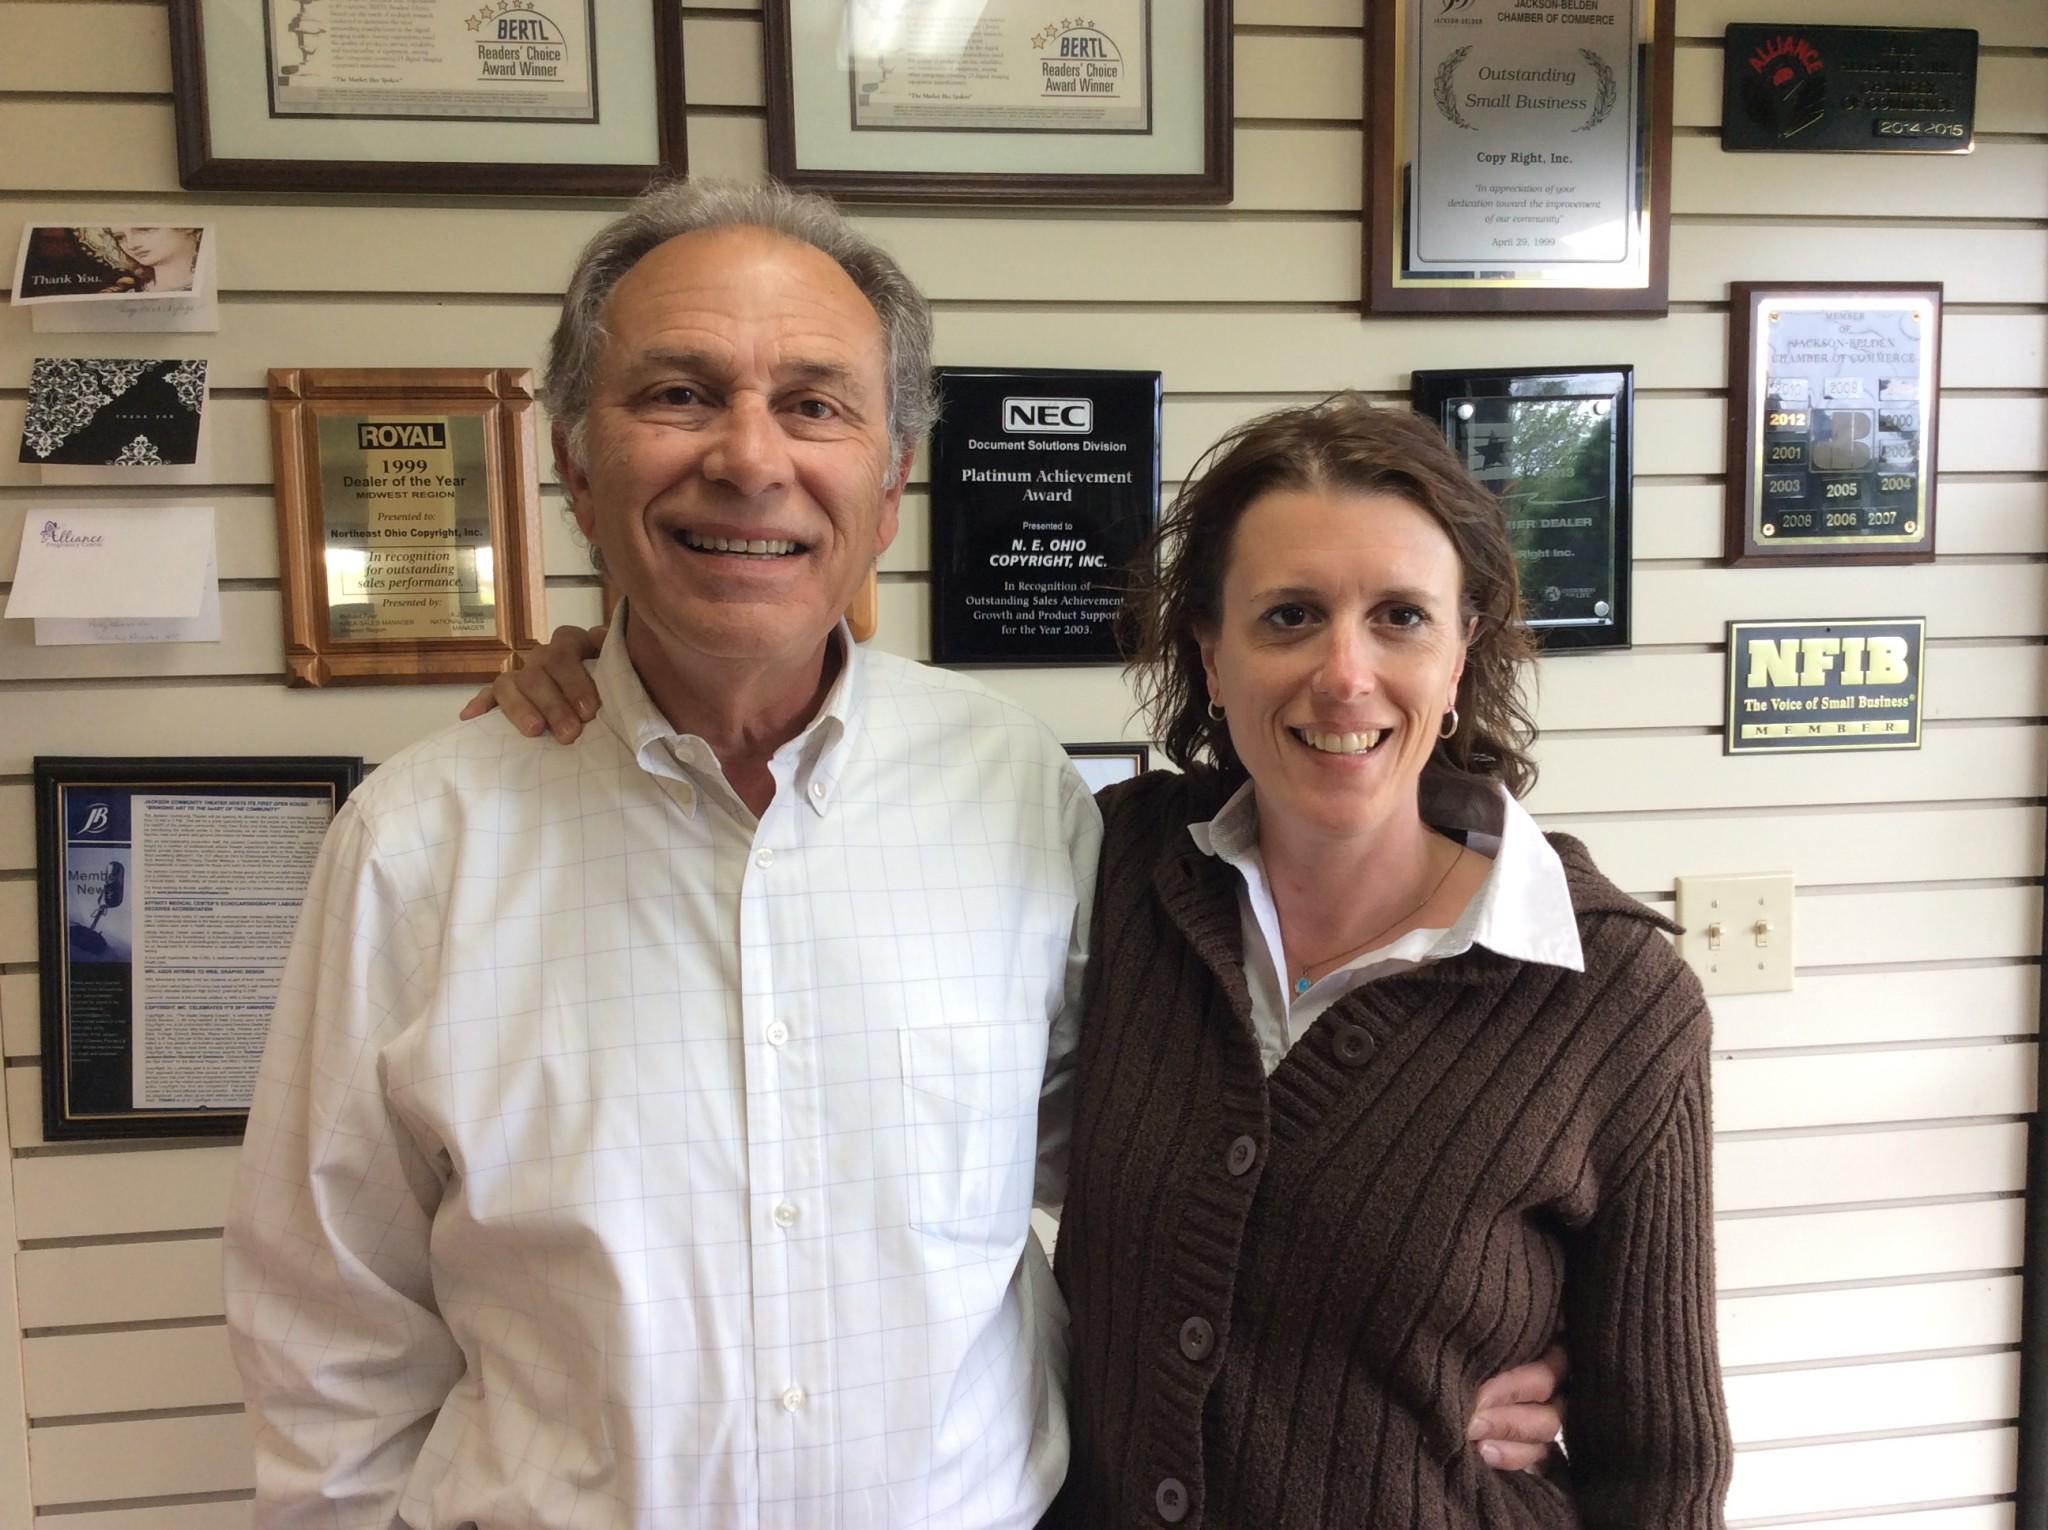 Randy and Olivia Muntean, CopyRight, Canton Ohio